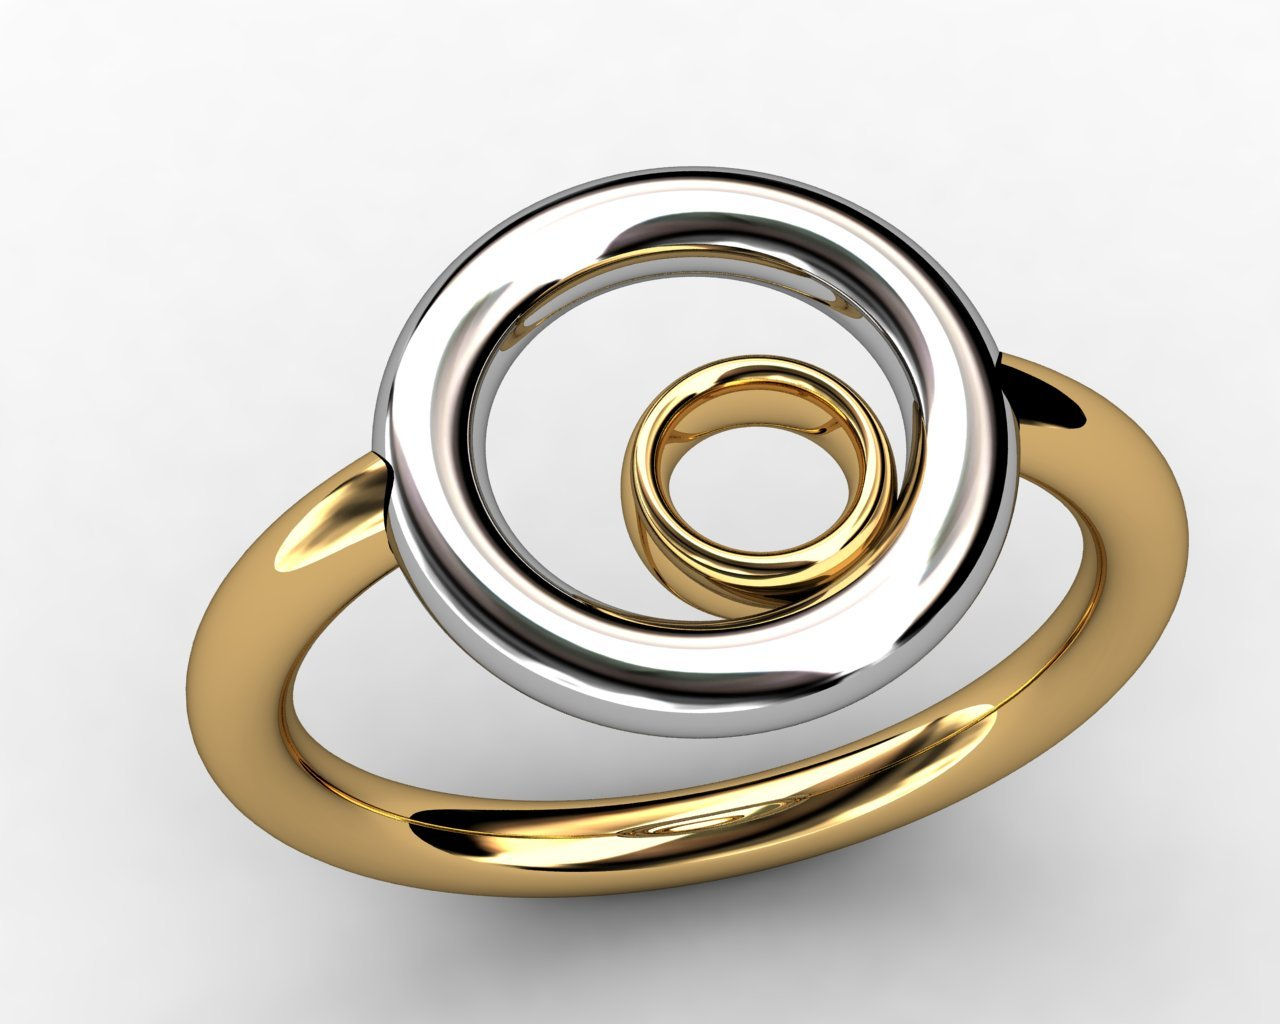 ring ring1.jpg